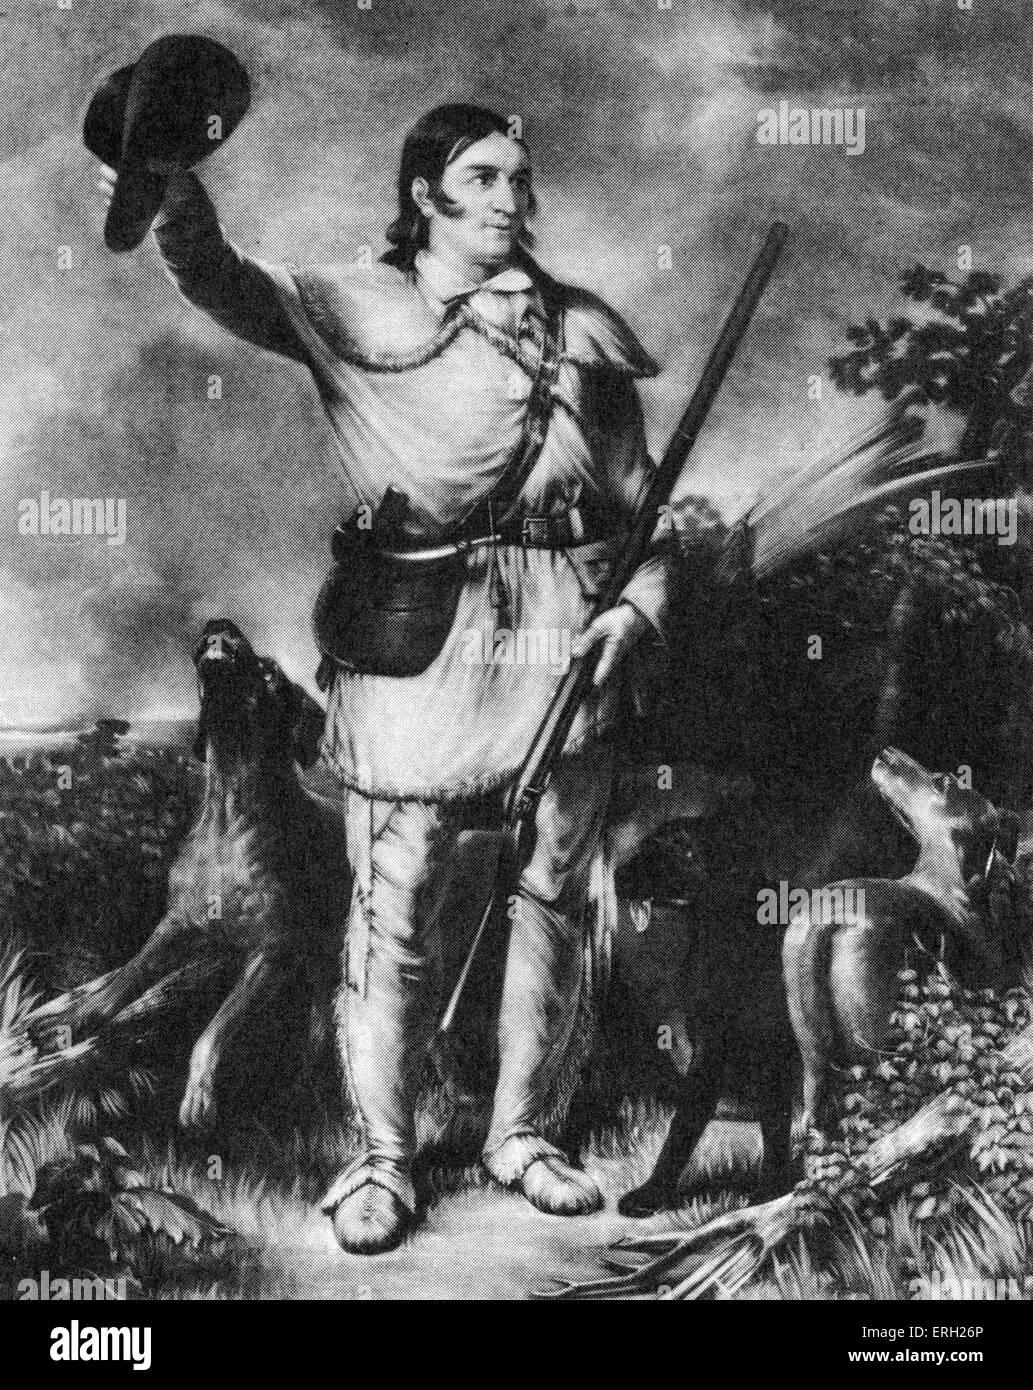 Davy Crocket. American folk hero: 17 August 1786- 6 March 1836. - Stock Image